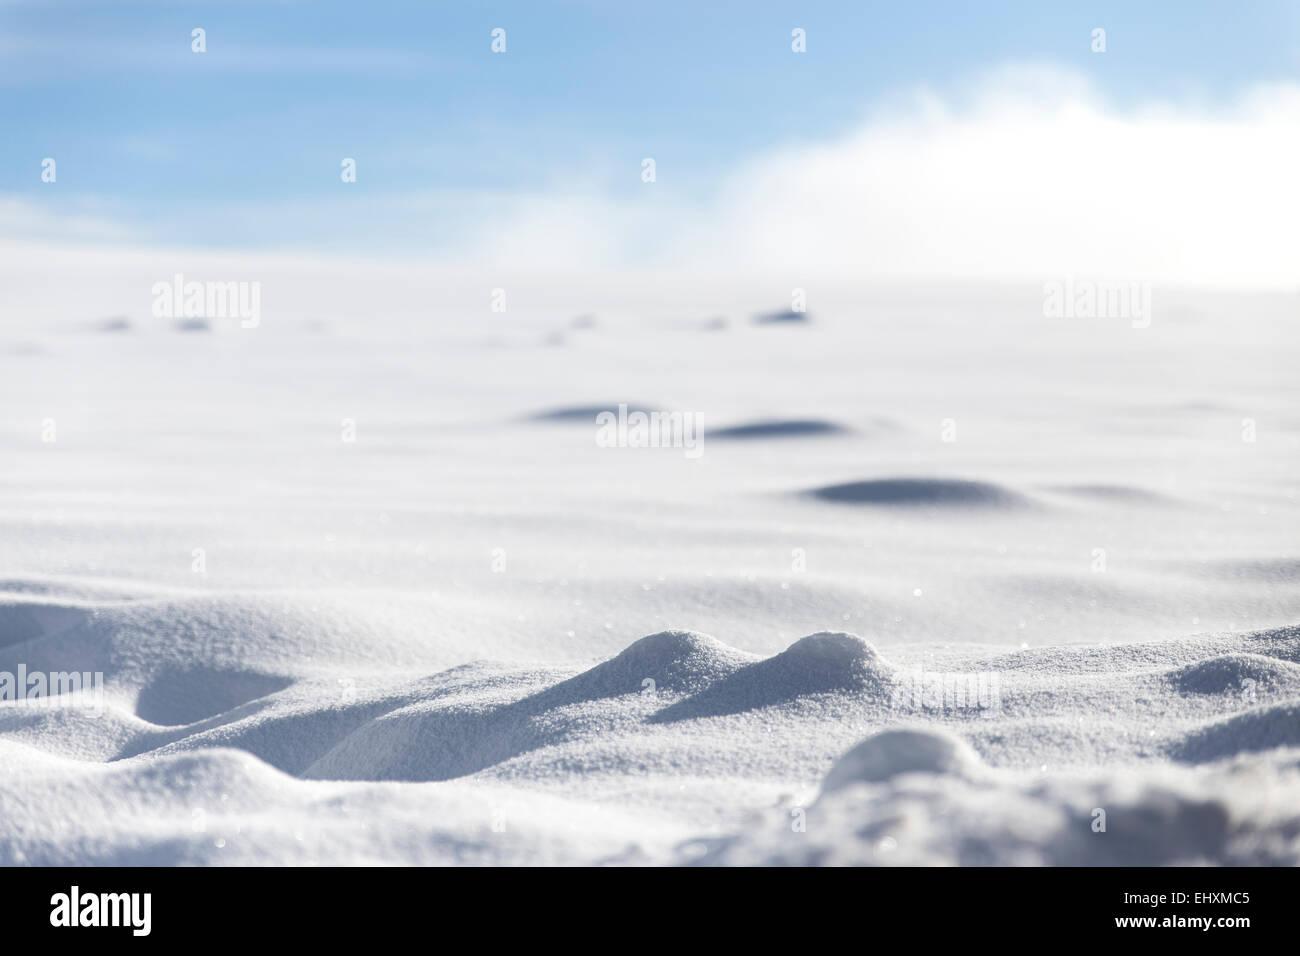 Germany, Baden-Wuerttemberg, Waldshut-Tiengen, Snow In